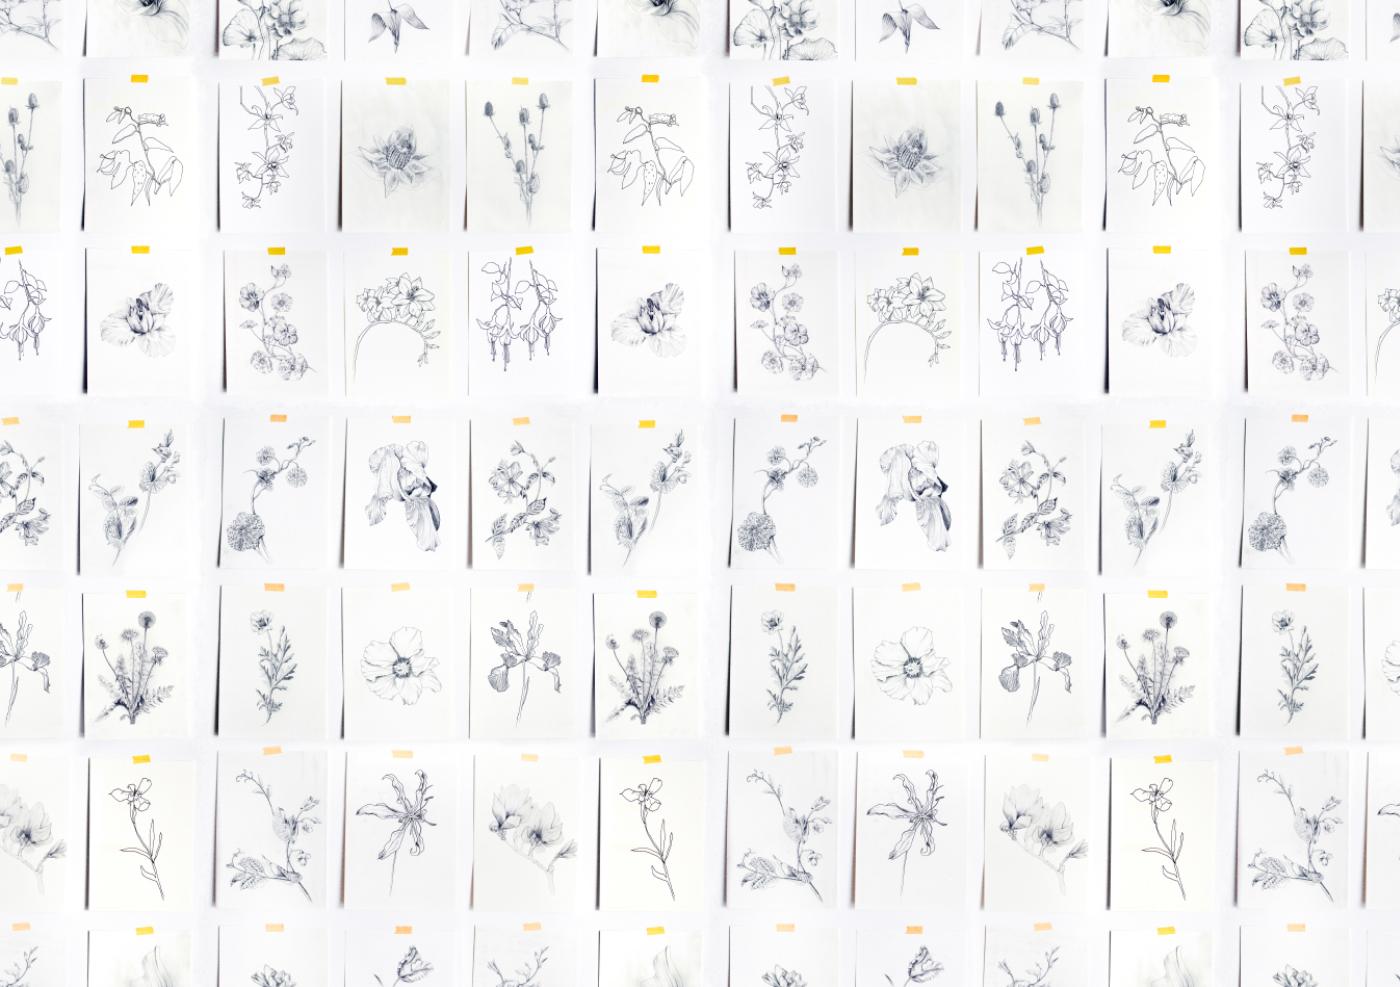 fig 1. Repeat Botanical Pattern